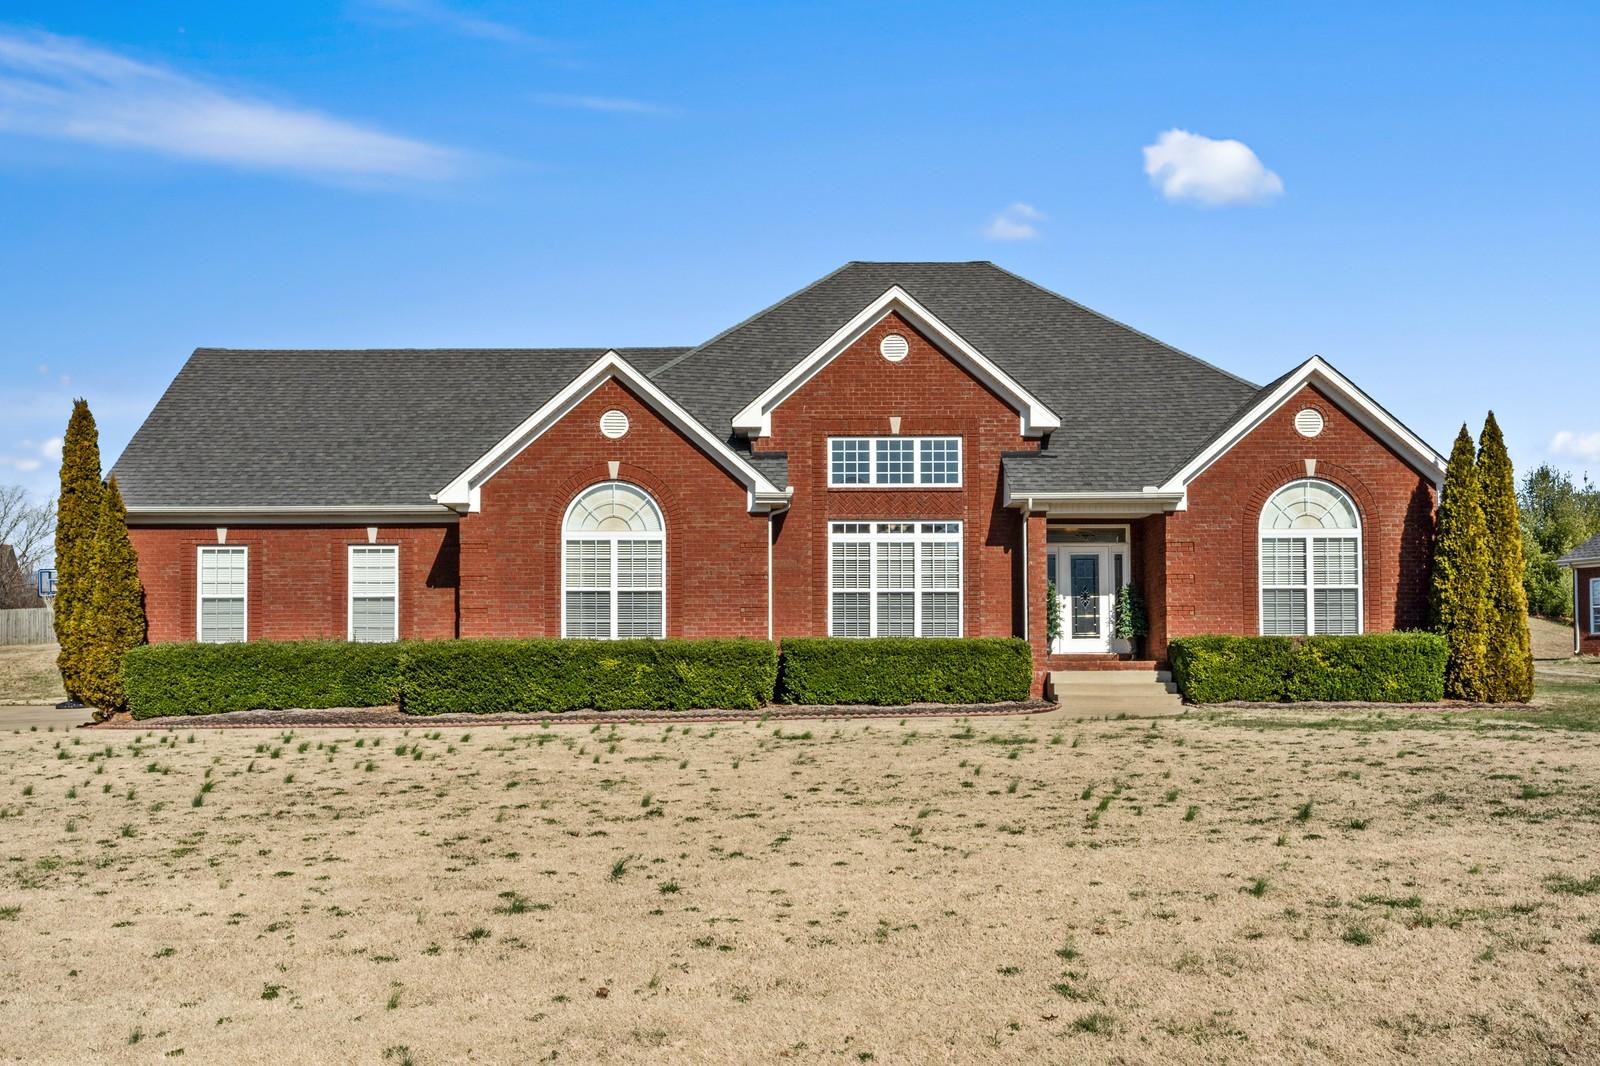 4059 Oak Pointe Dr, Pleasant View, TN 37146 - Pleasant View, TN real estate listing